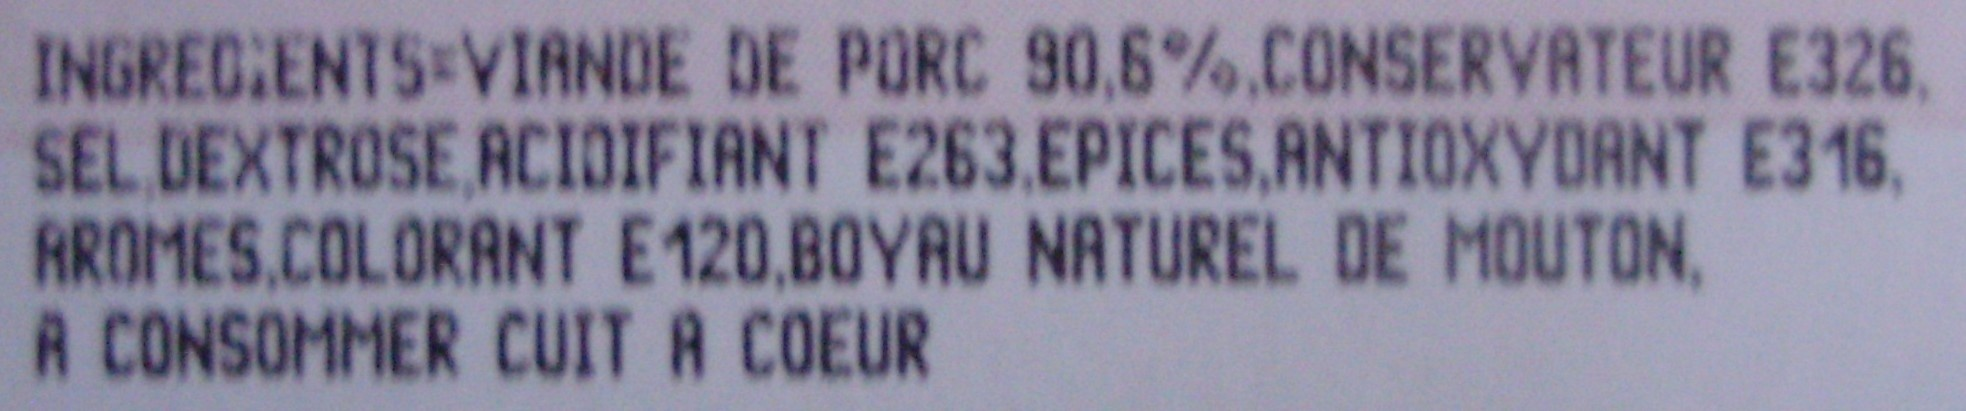 6 Chipolatas Pur Porc - Ingrédients - fr